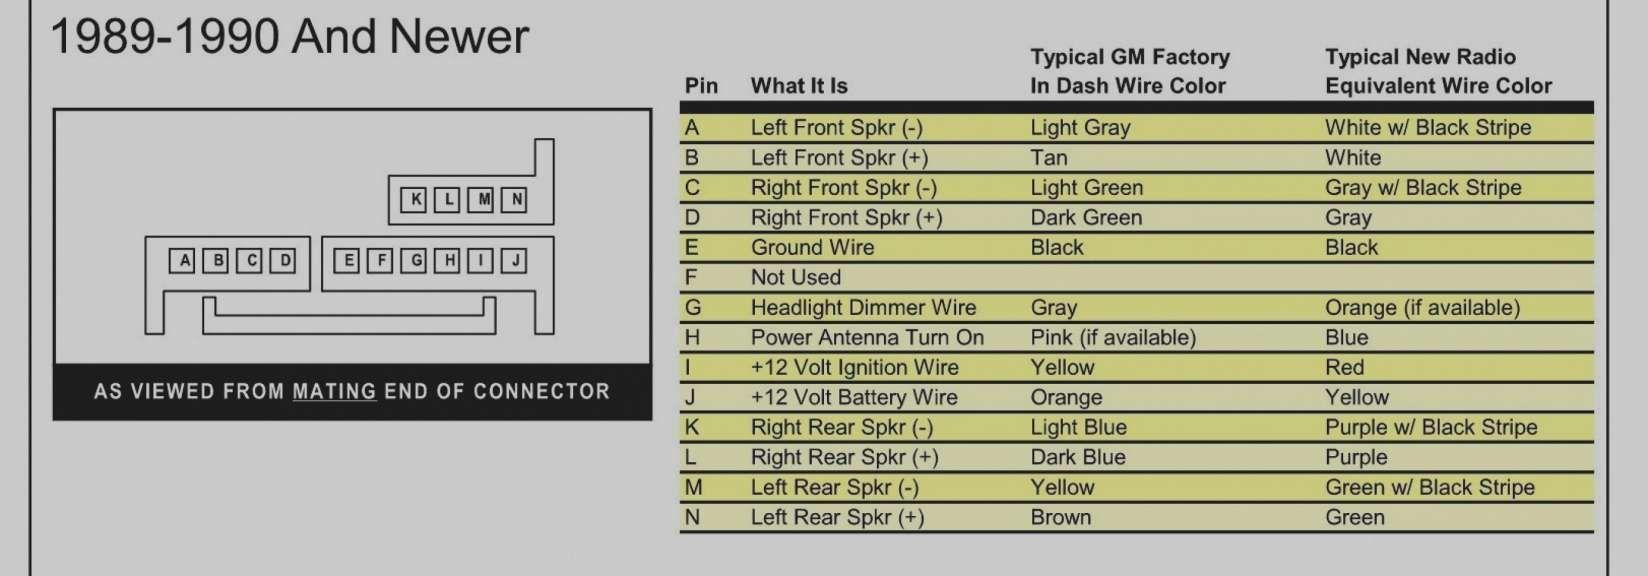 12 2001 Chevy Truck Radio Wiring Diagram Truck Diagram Wiringg Net In 2021 Chevy Radio Chevy Tahoe